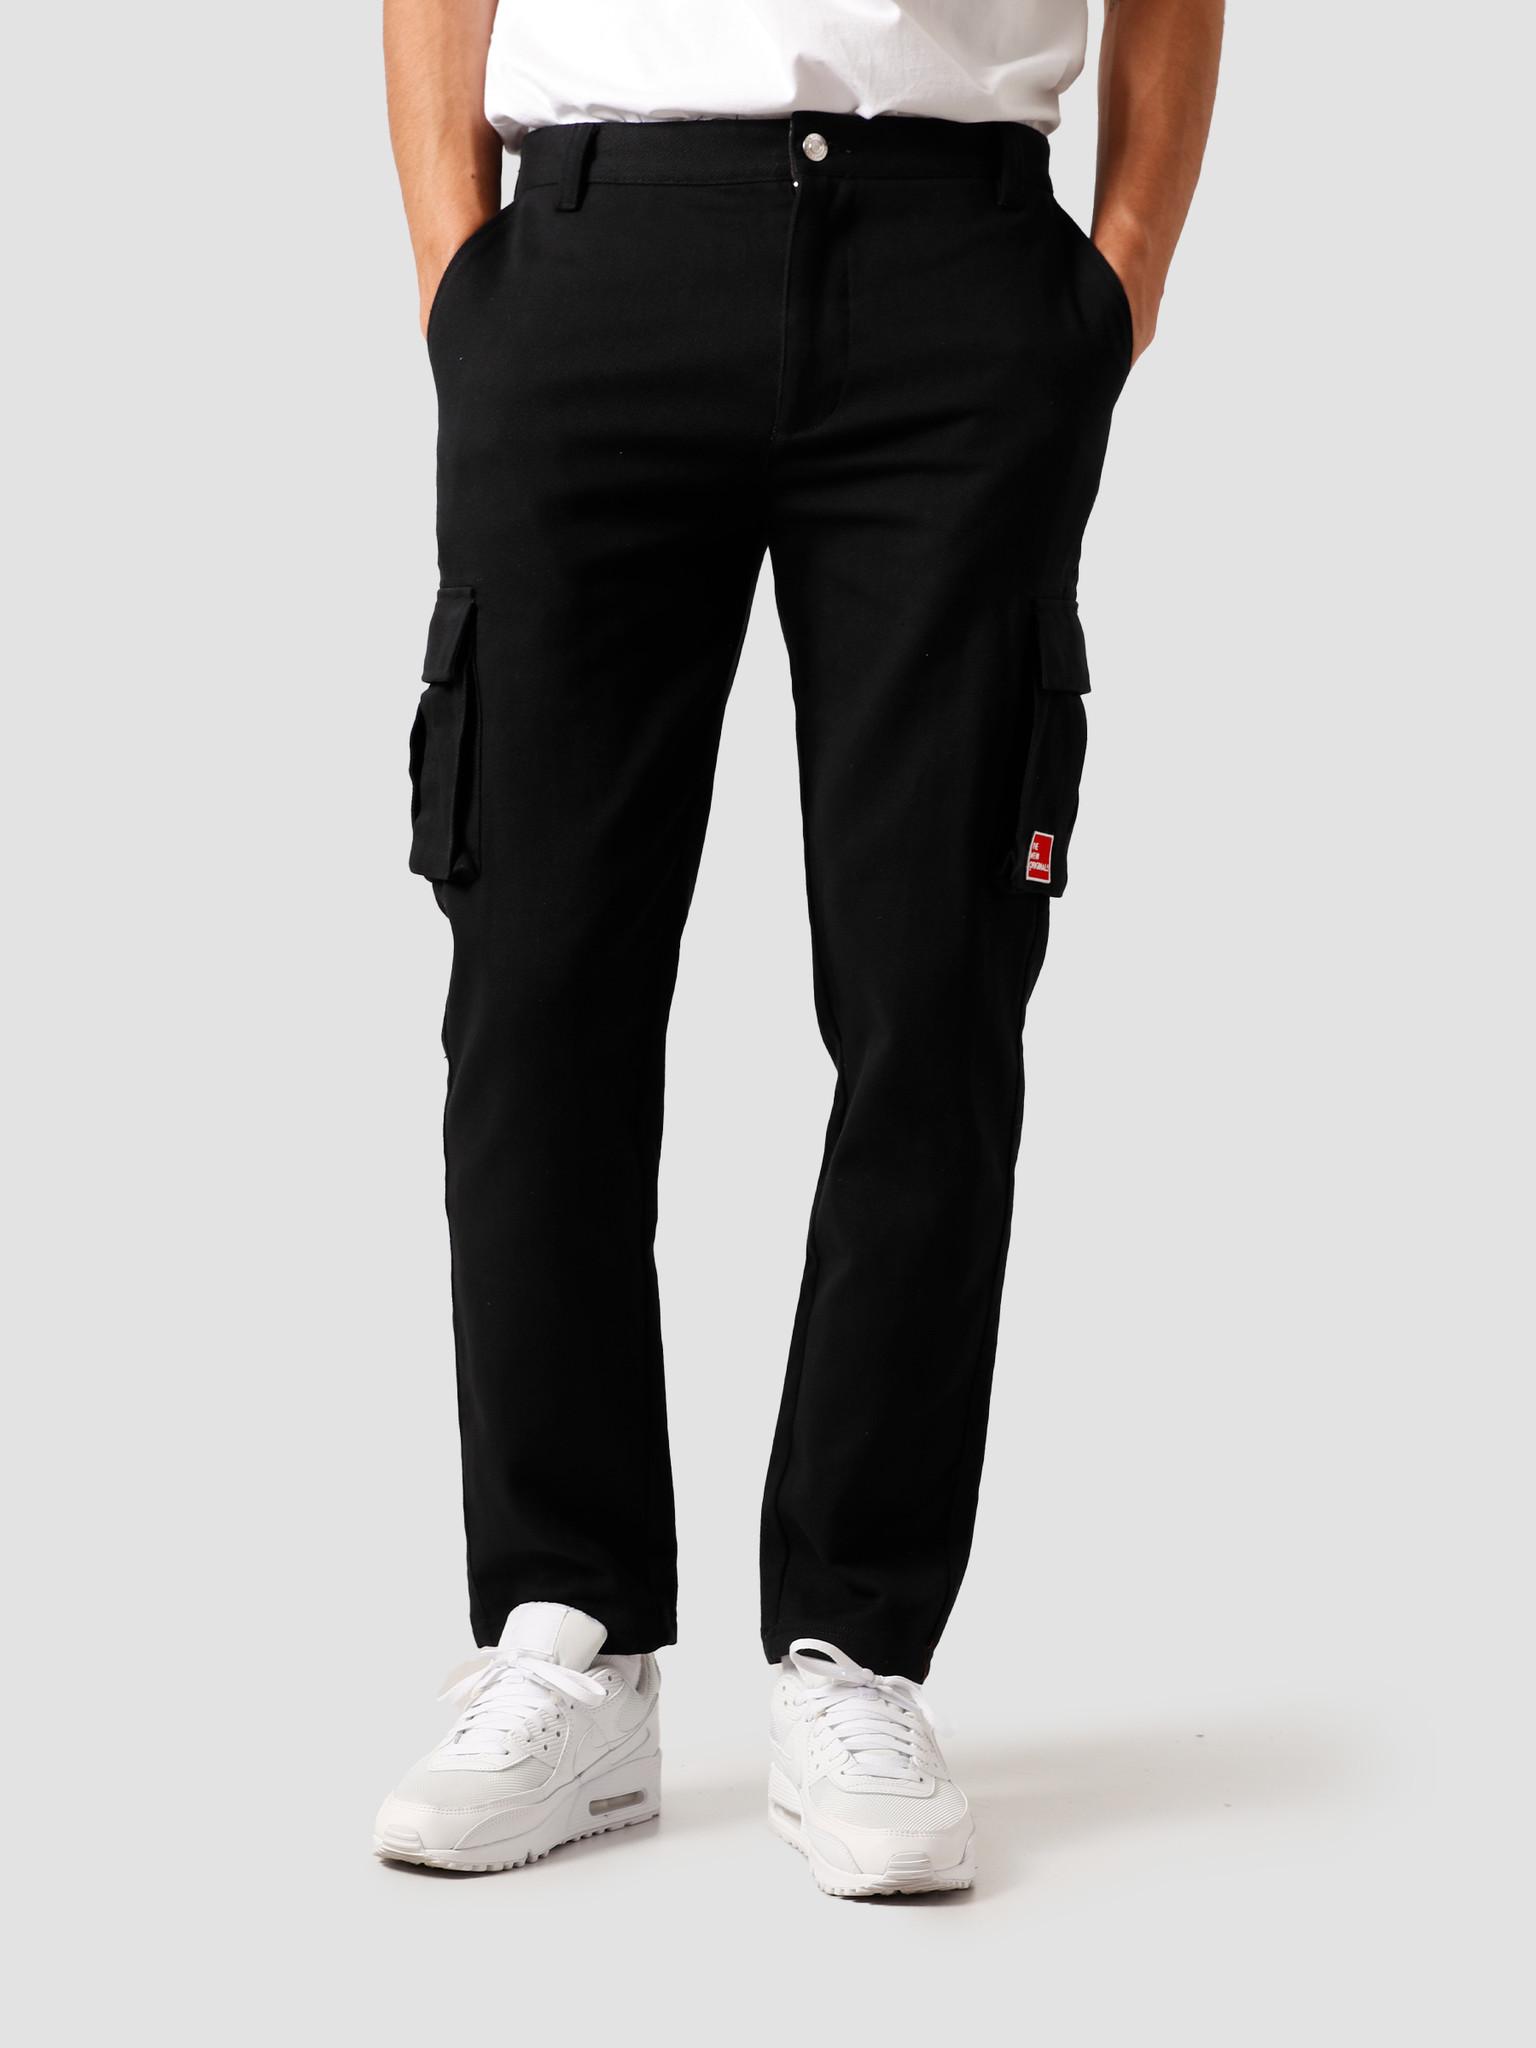 The New Originals The New Originals Carota Midfield Trousers Black